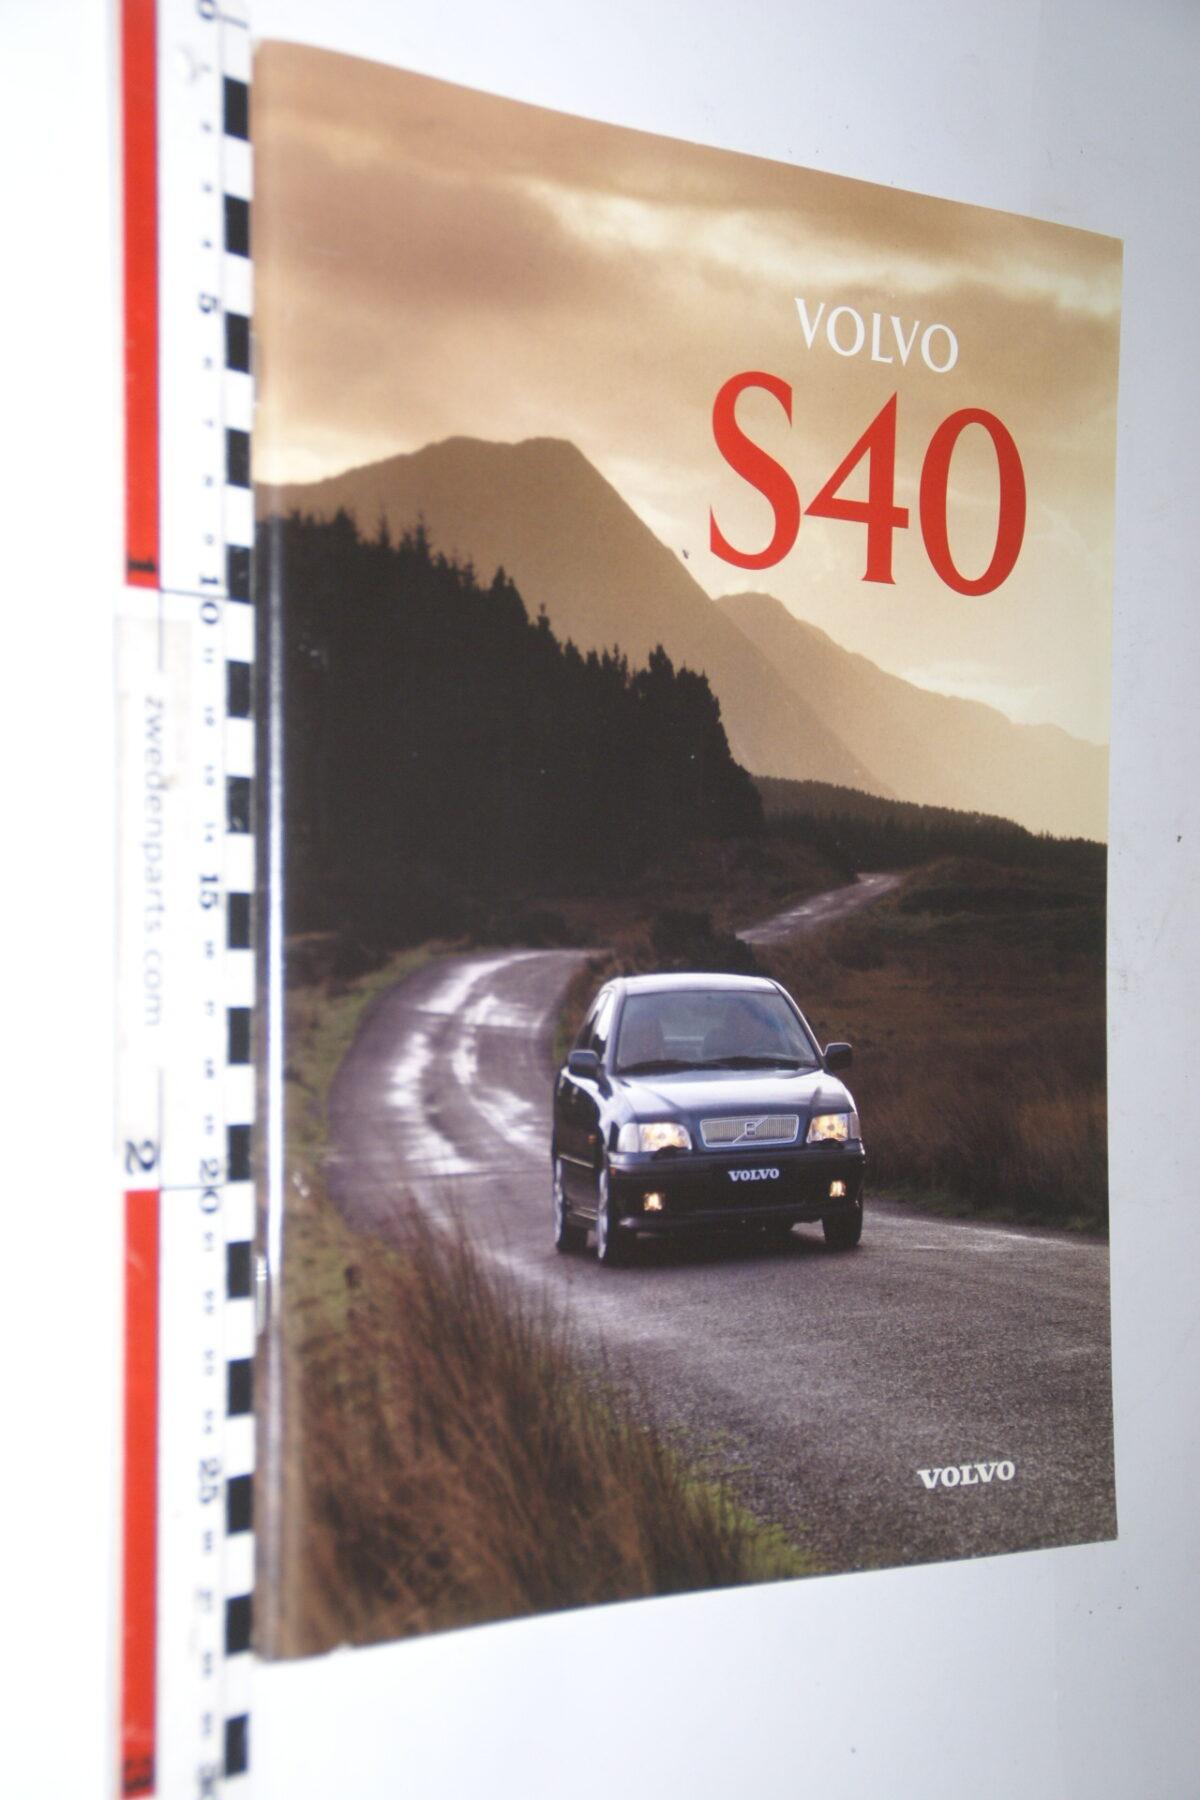 DSC05001 1996 originele brochure nr. MSPV 8055-96 Volvo S40-046fd568